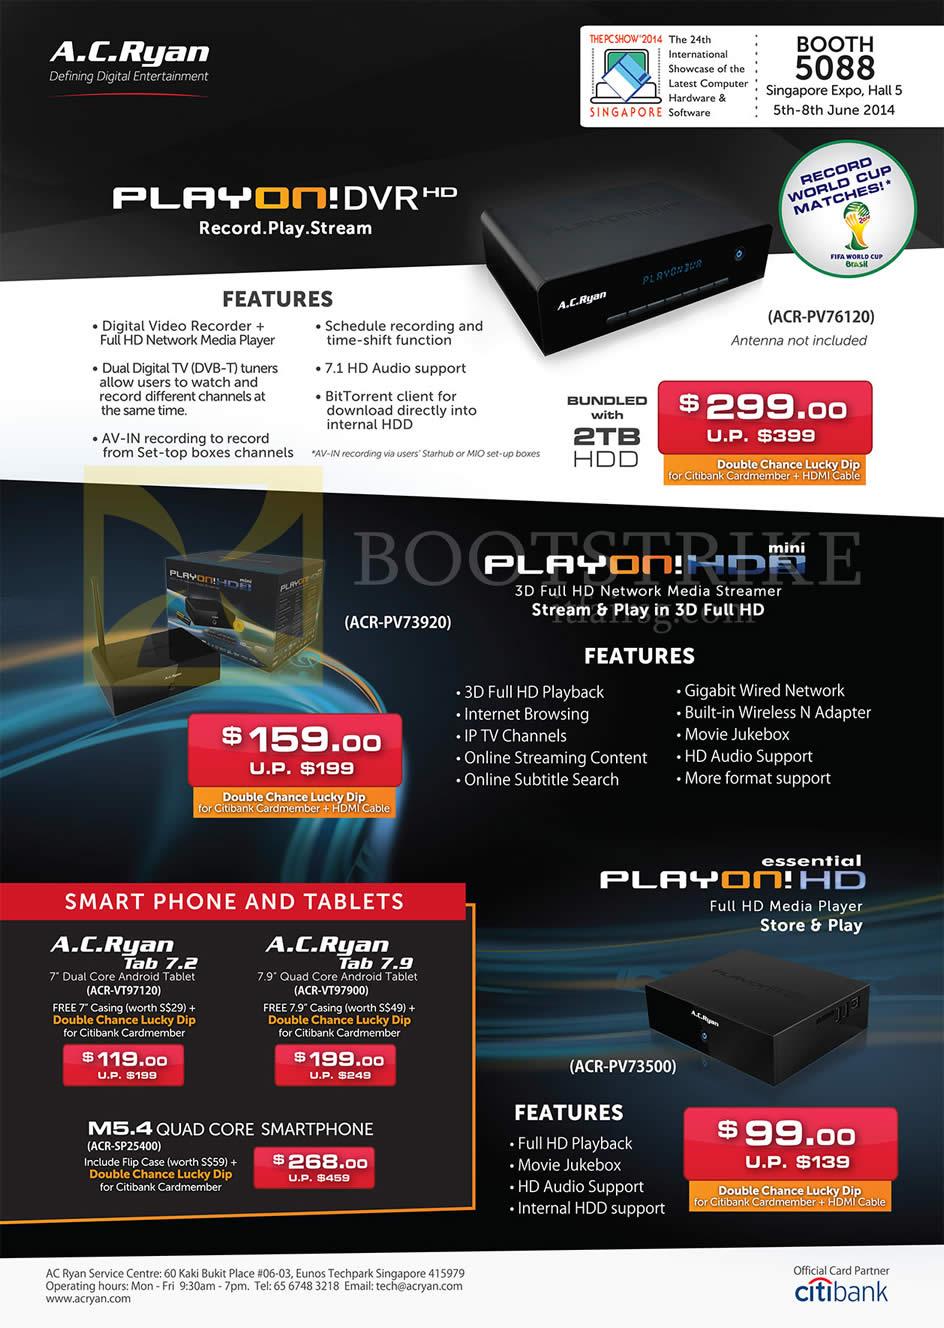 PC SHOW 2014 price list image brochure of AC Ryan PlayOn DVR HD ACR-PV76120 Recorder, Playon HD2 Mini Media Streamer ACR-PV73920, PlayOn HD Essential Media Palyer, Tab 7.2 Tab 7.9, M5.4 Smartphone